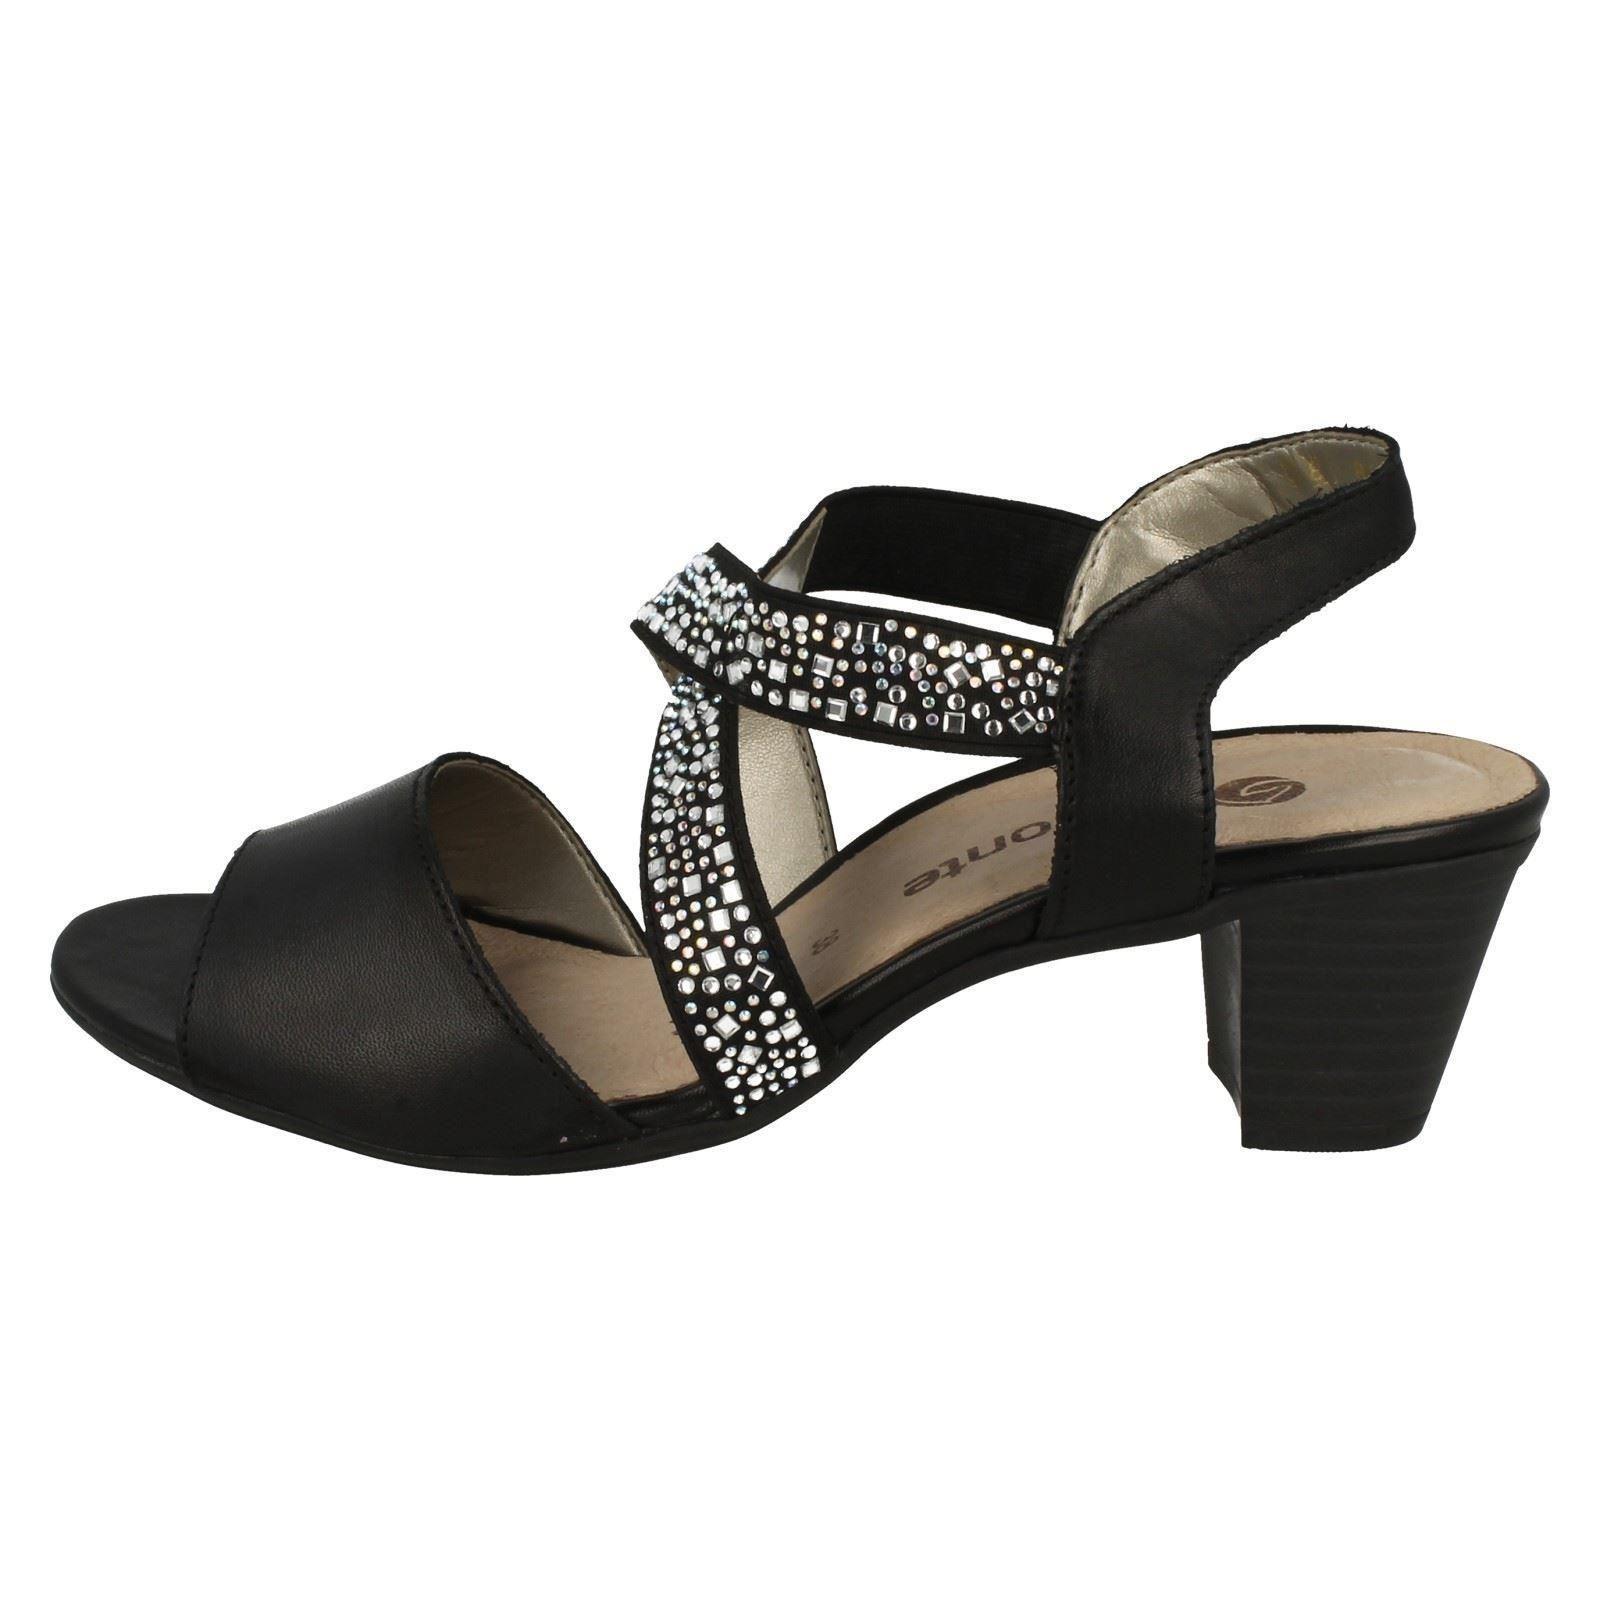 Remonte Ladies X Strap Heeled Heeled Heeled Sandals R9272 3ec28f